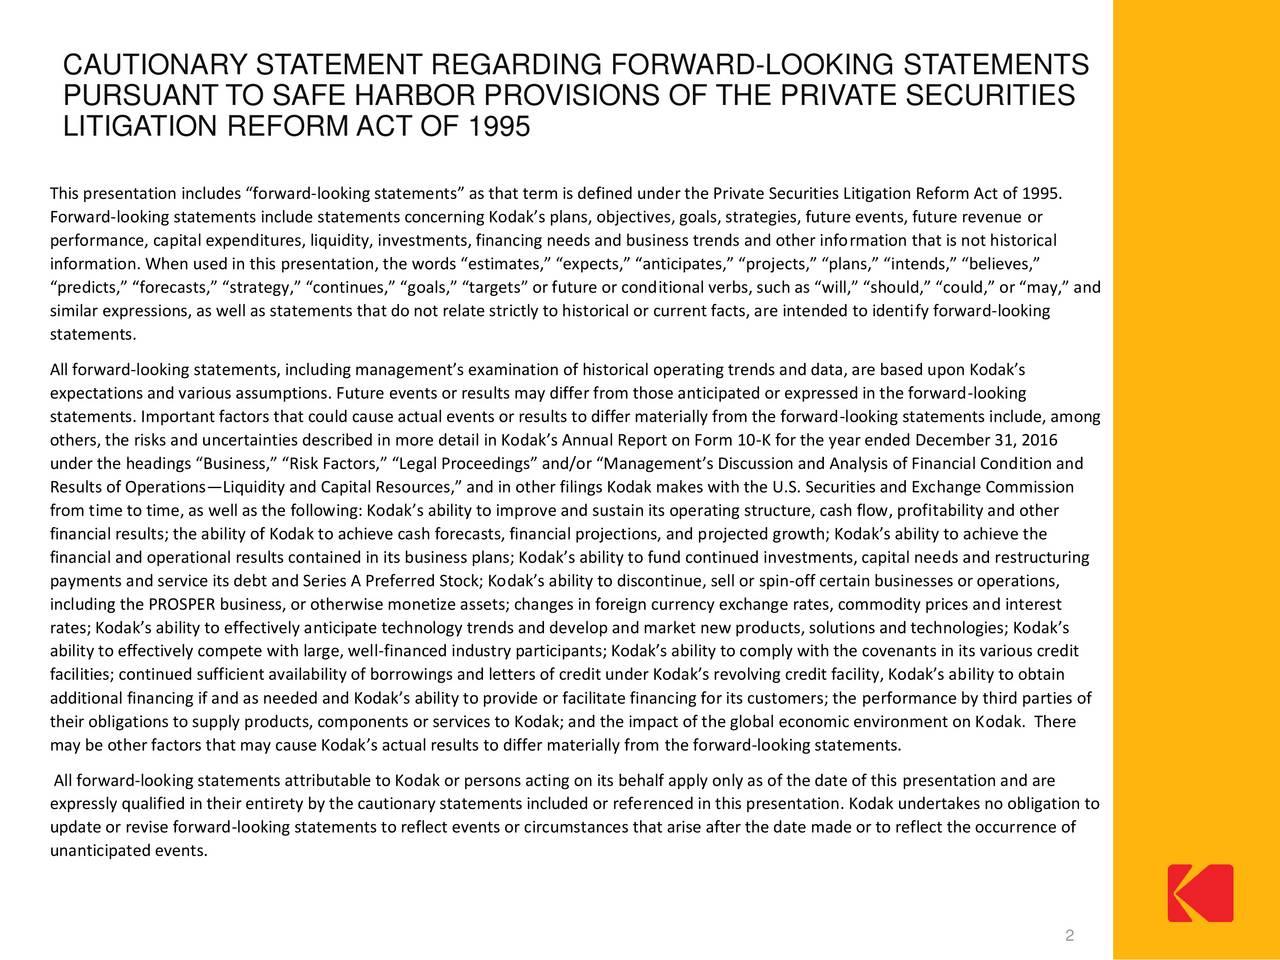 Eastman kodak global subpply chain strategy